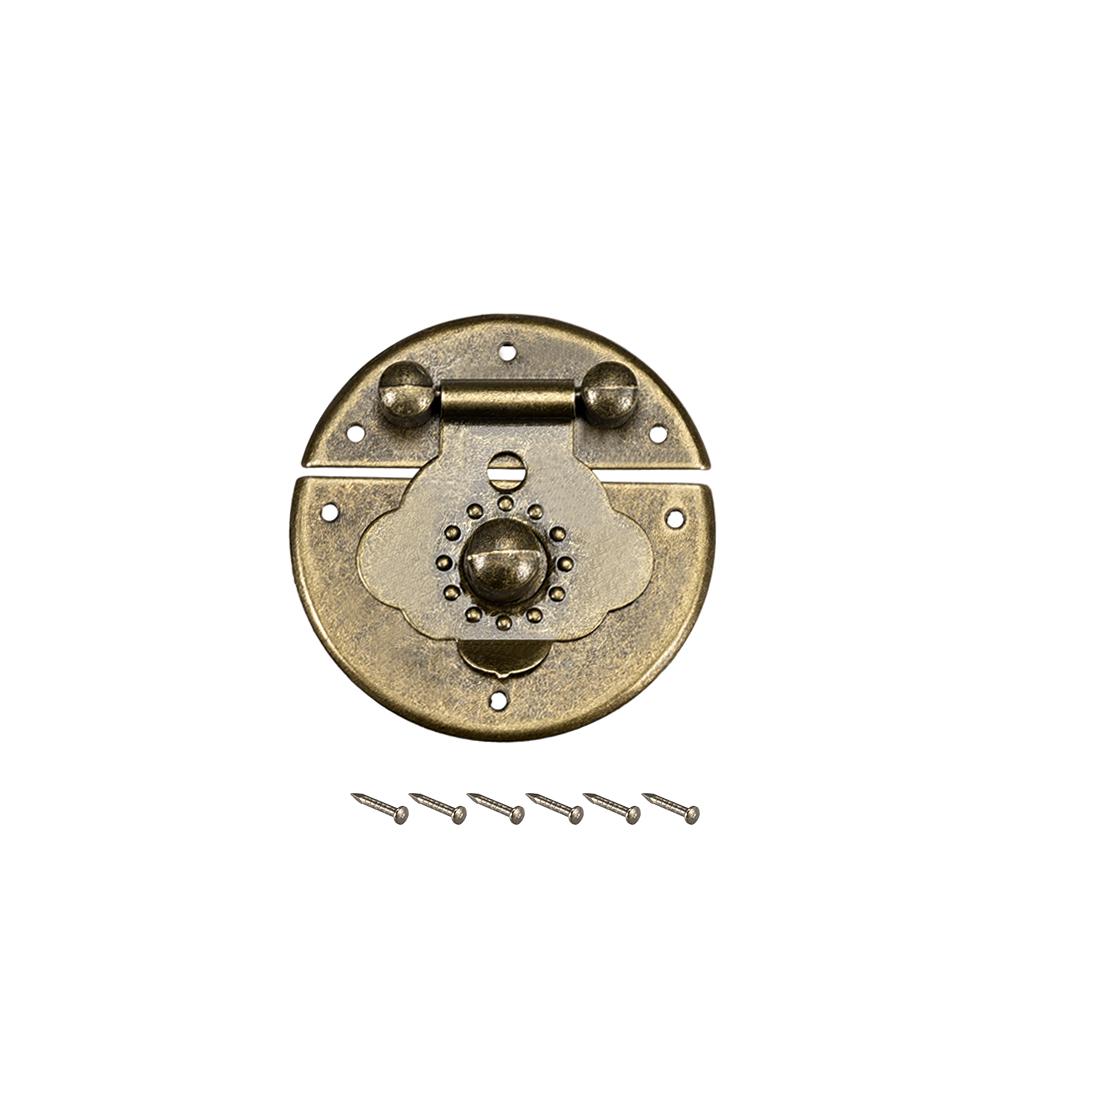 Wood Case Box Round Hasp 41x10.5mm Closure Antique Latches Bronze Tone, 2 Pcs